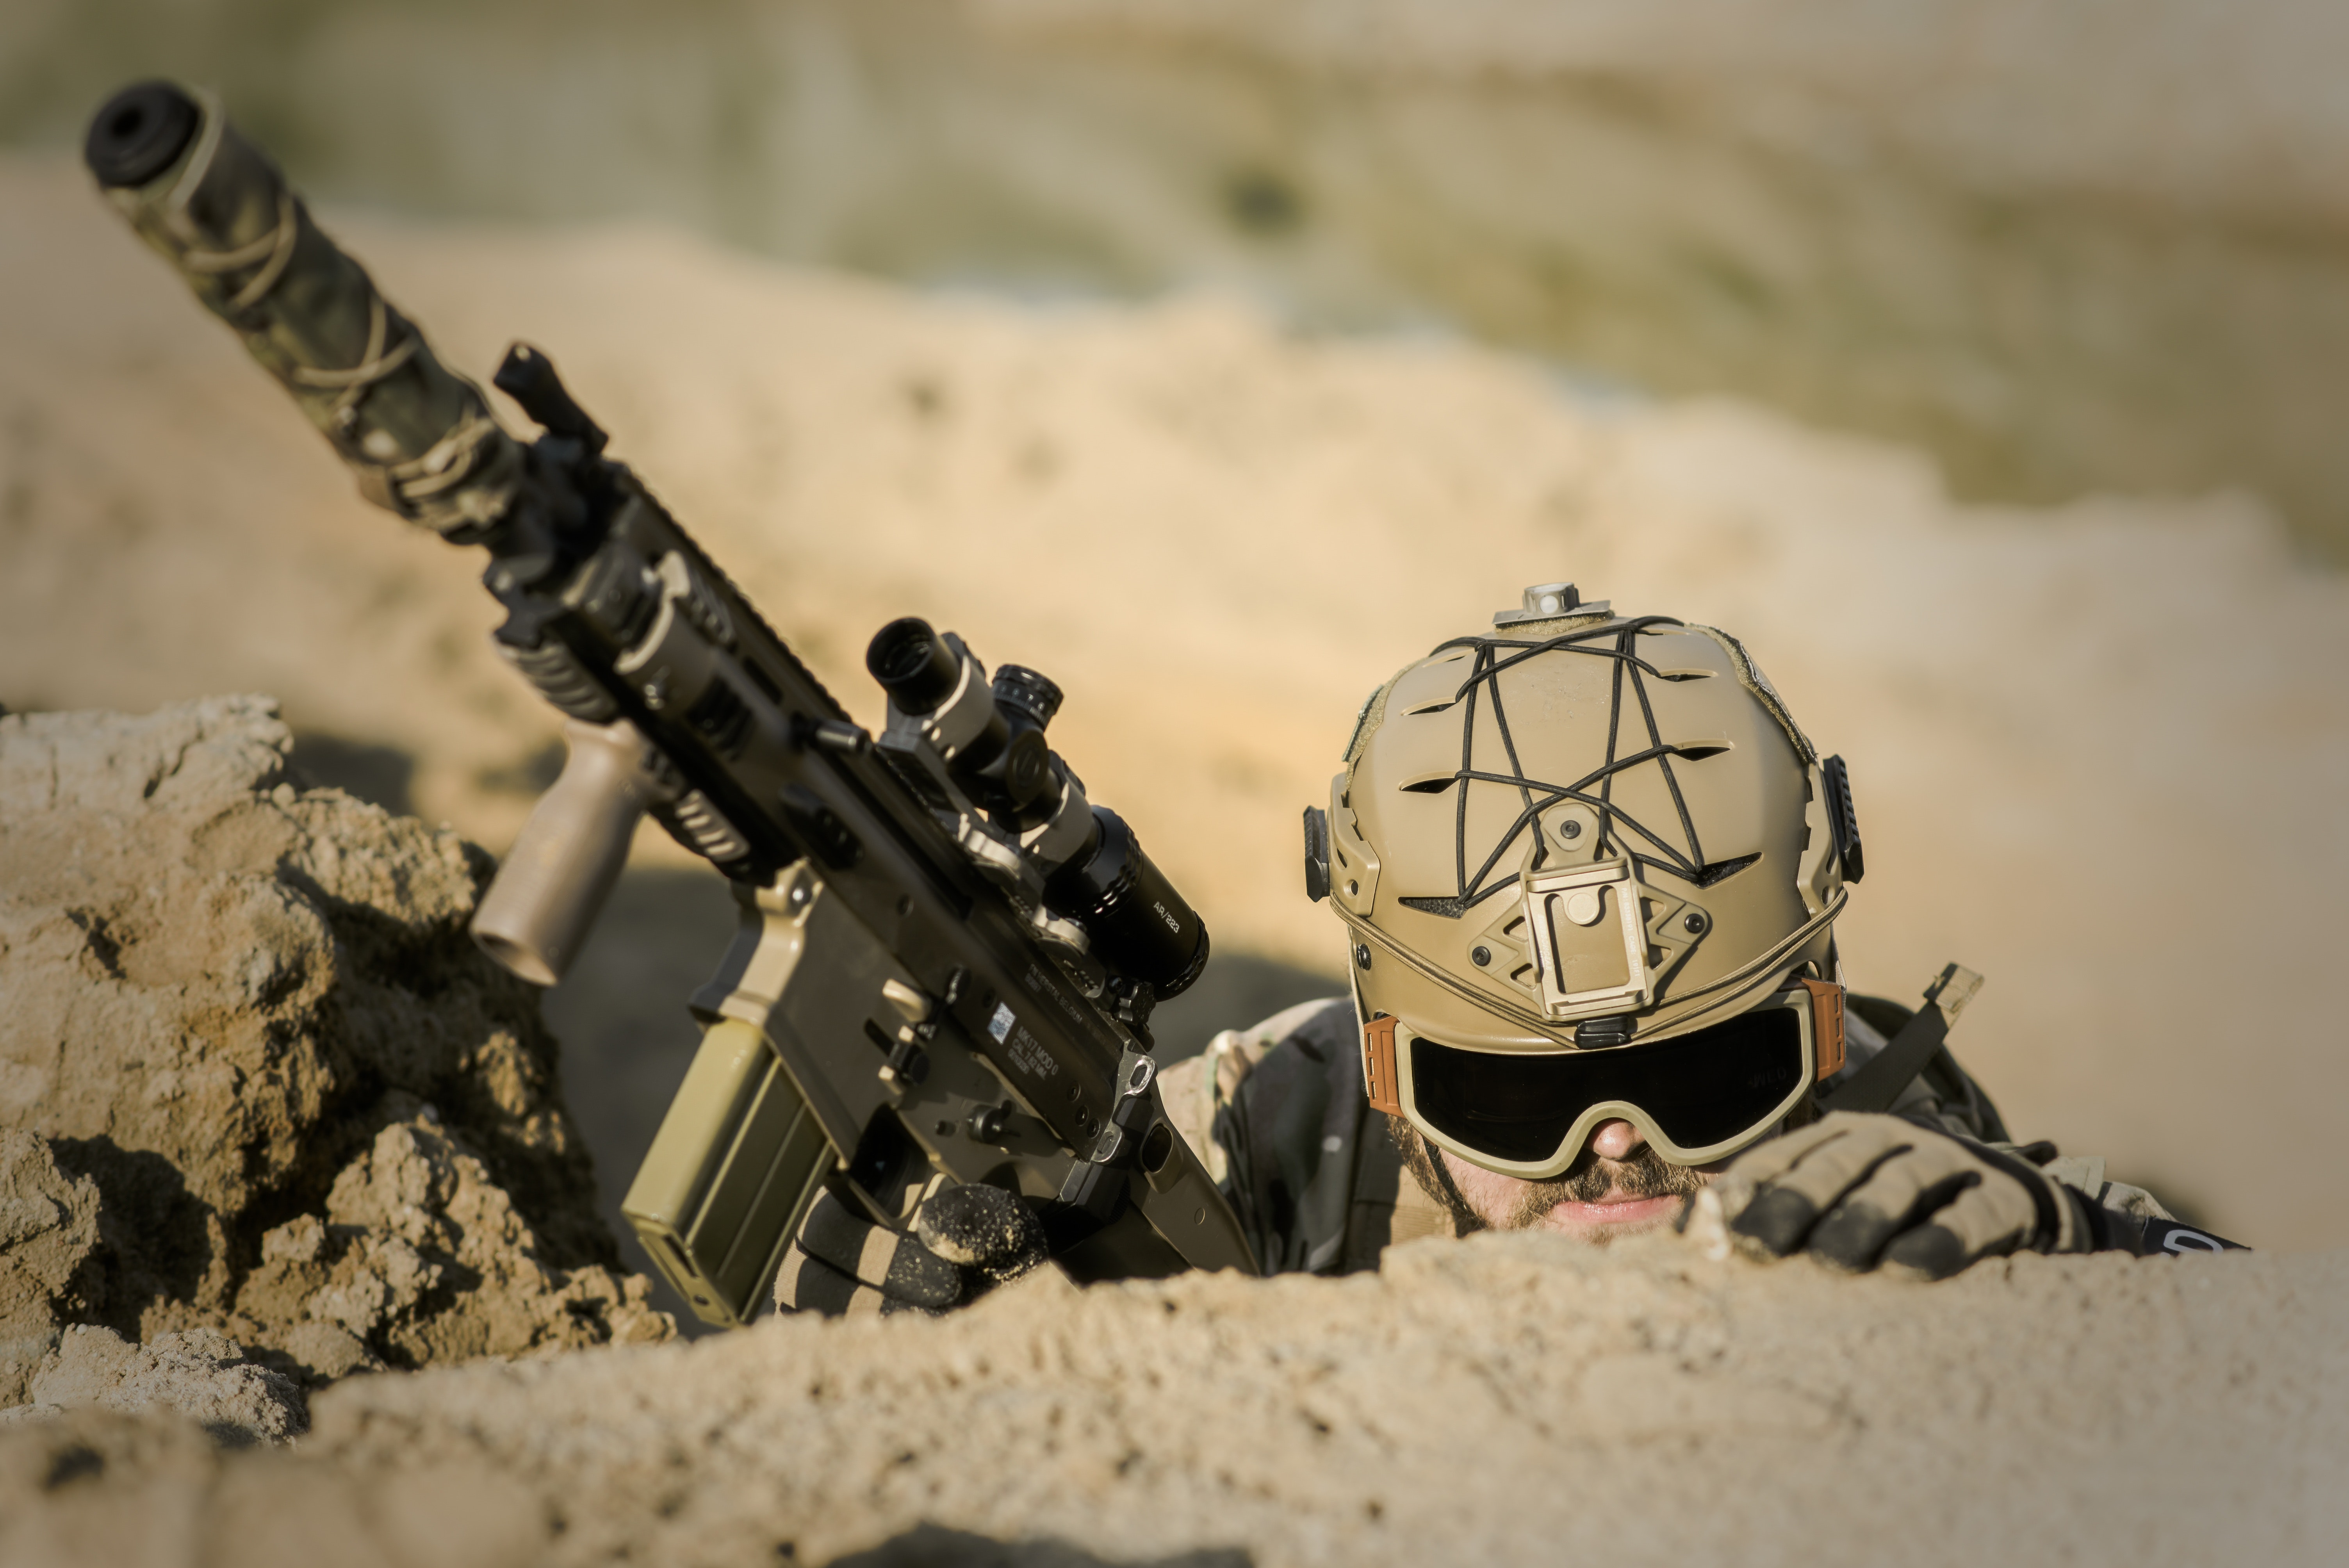 Soldier wearing brown helmet holding assault rifle during daytime photo